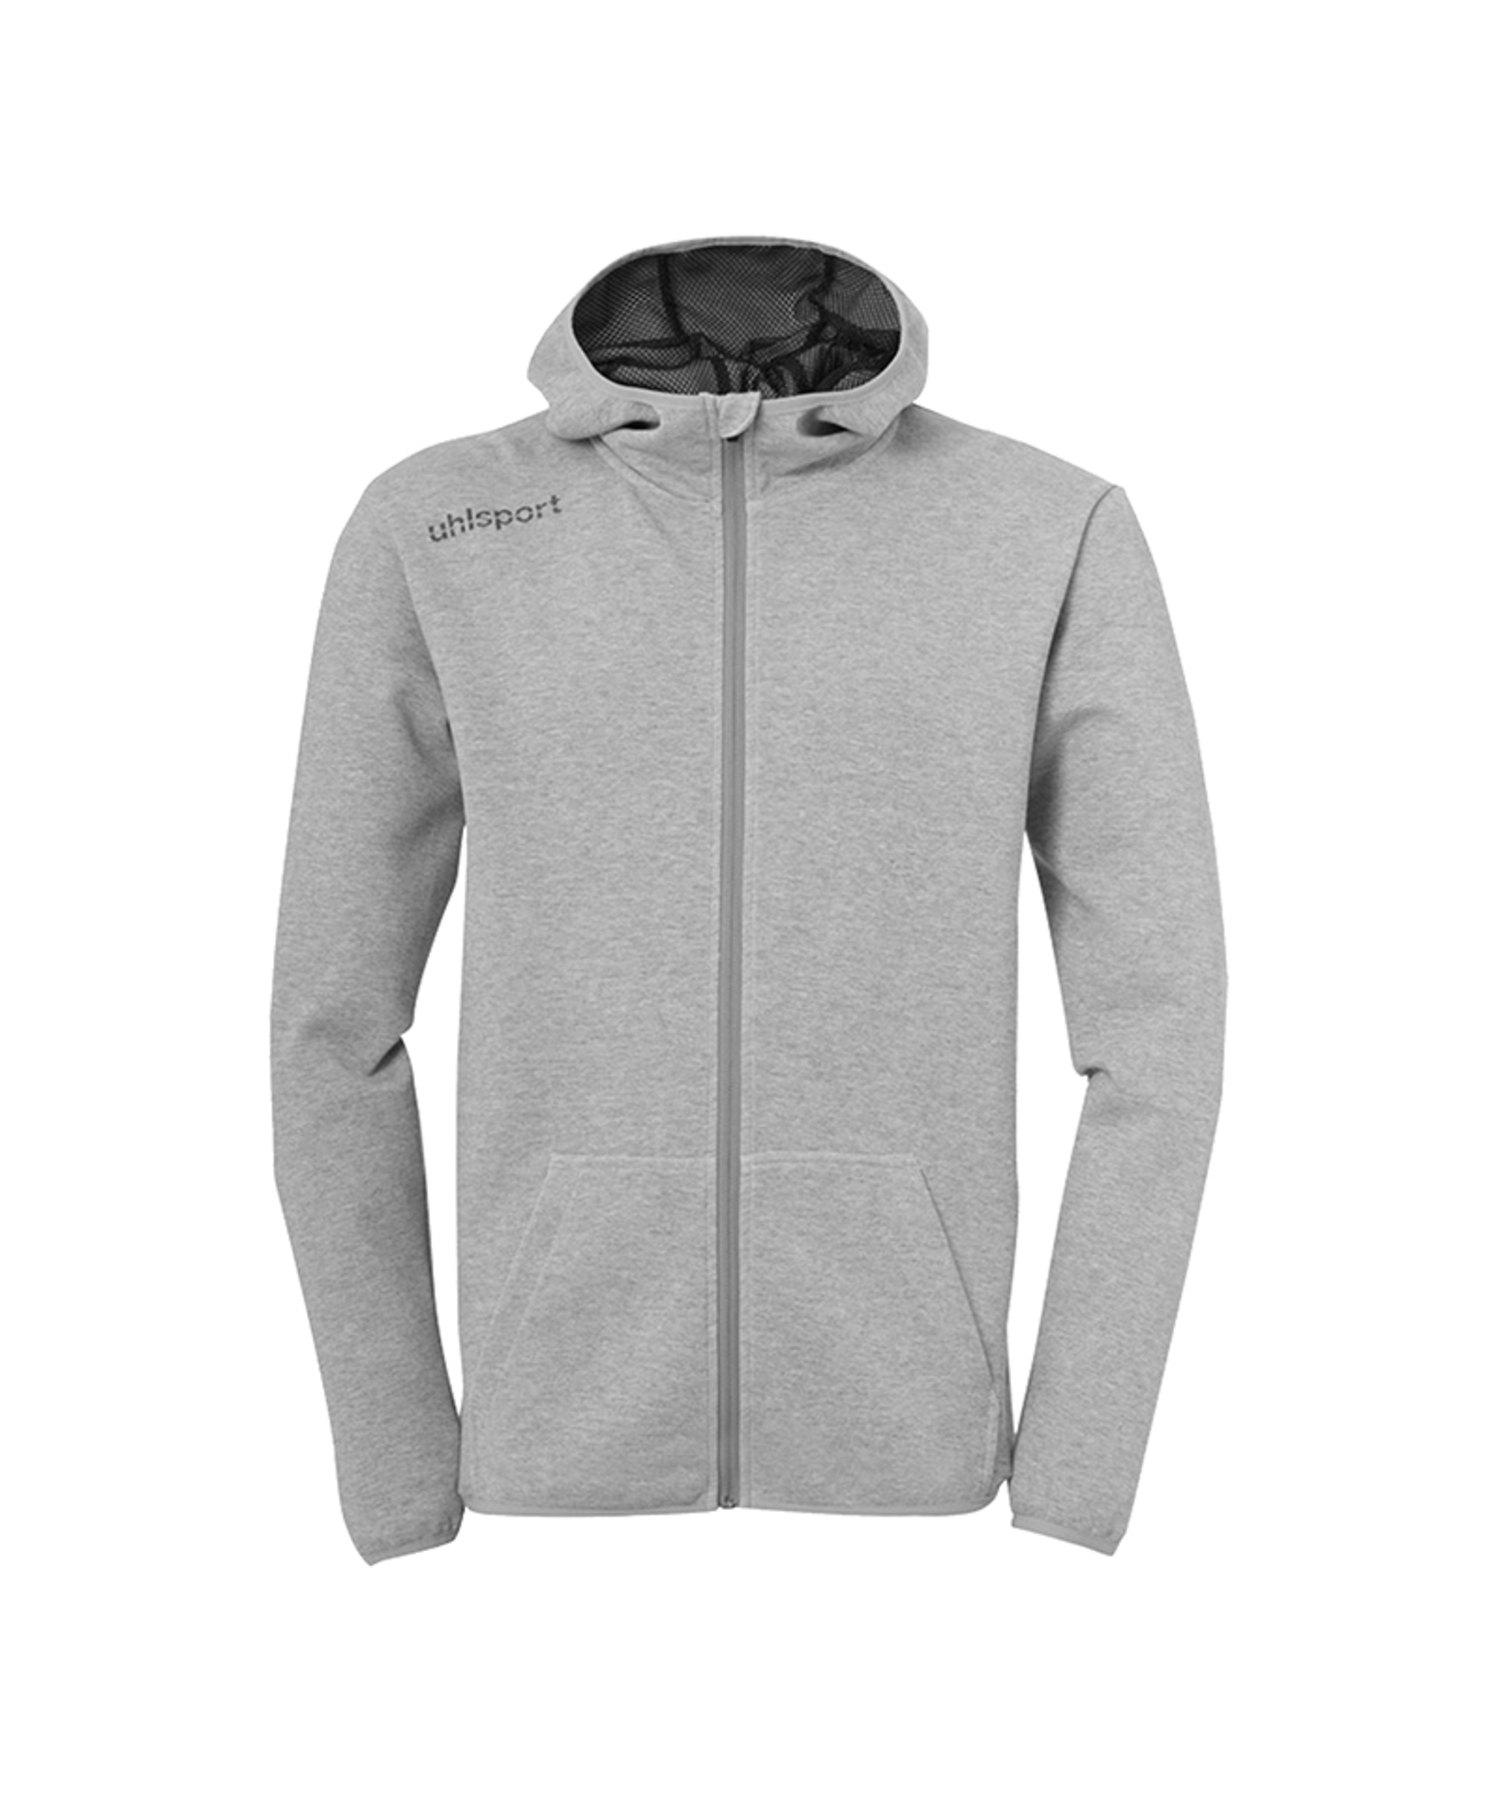 Uhlsport Essential Kapuzenjacke Grau F15 - grau